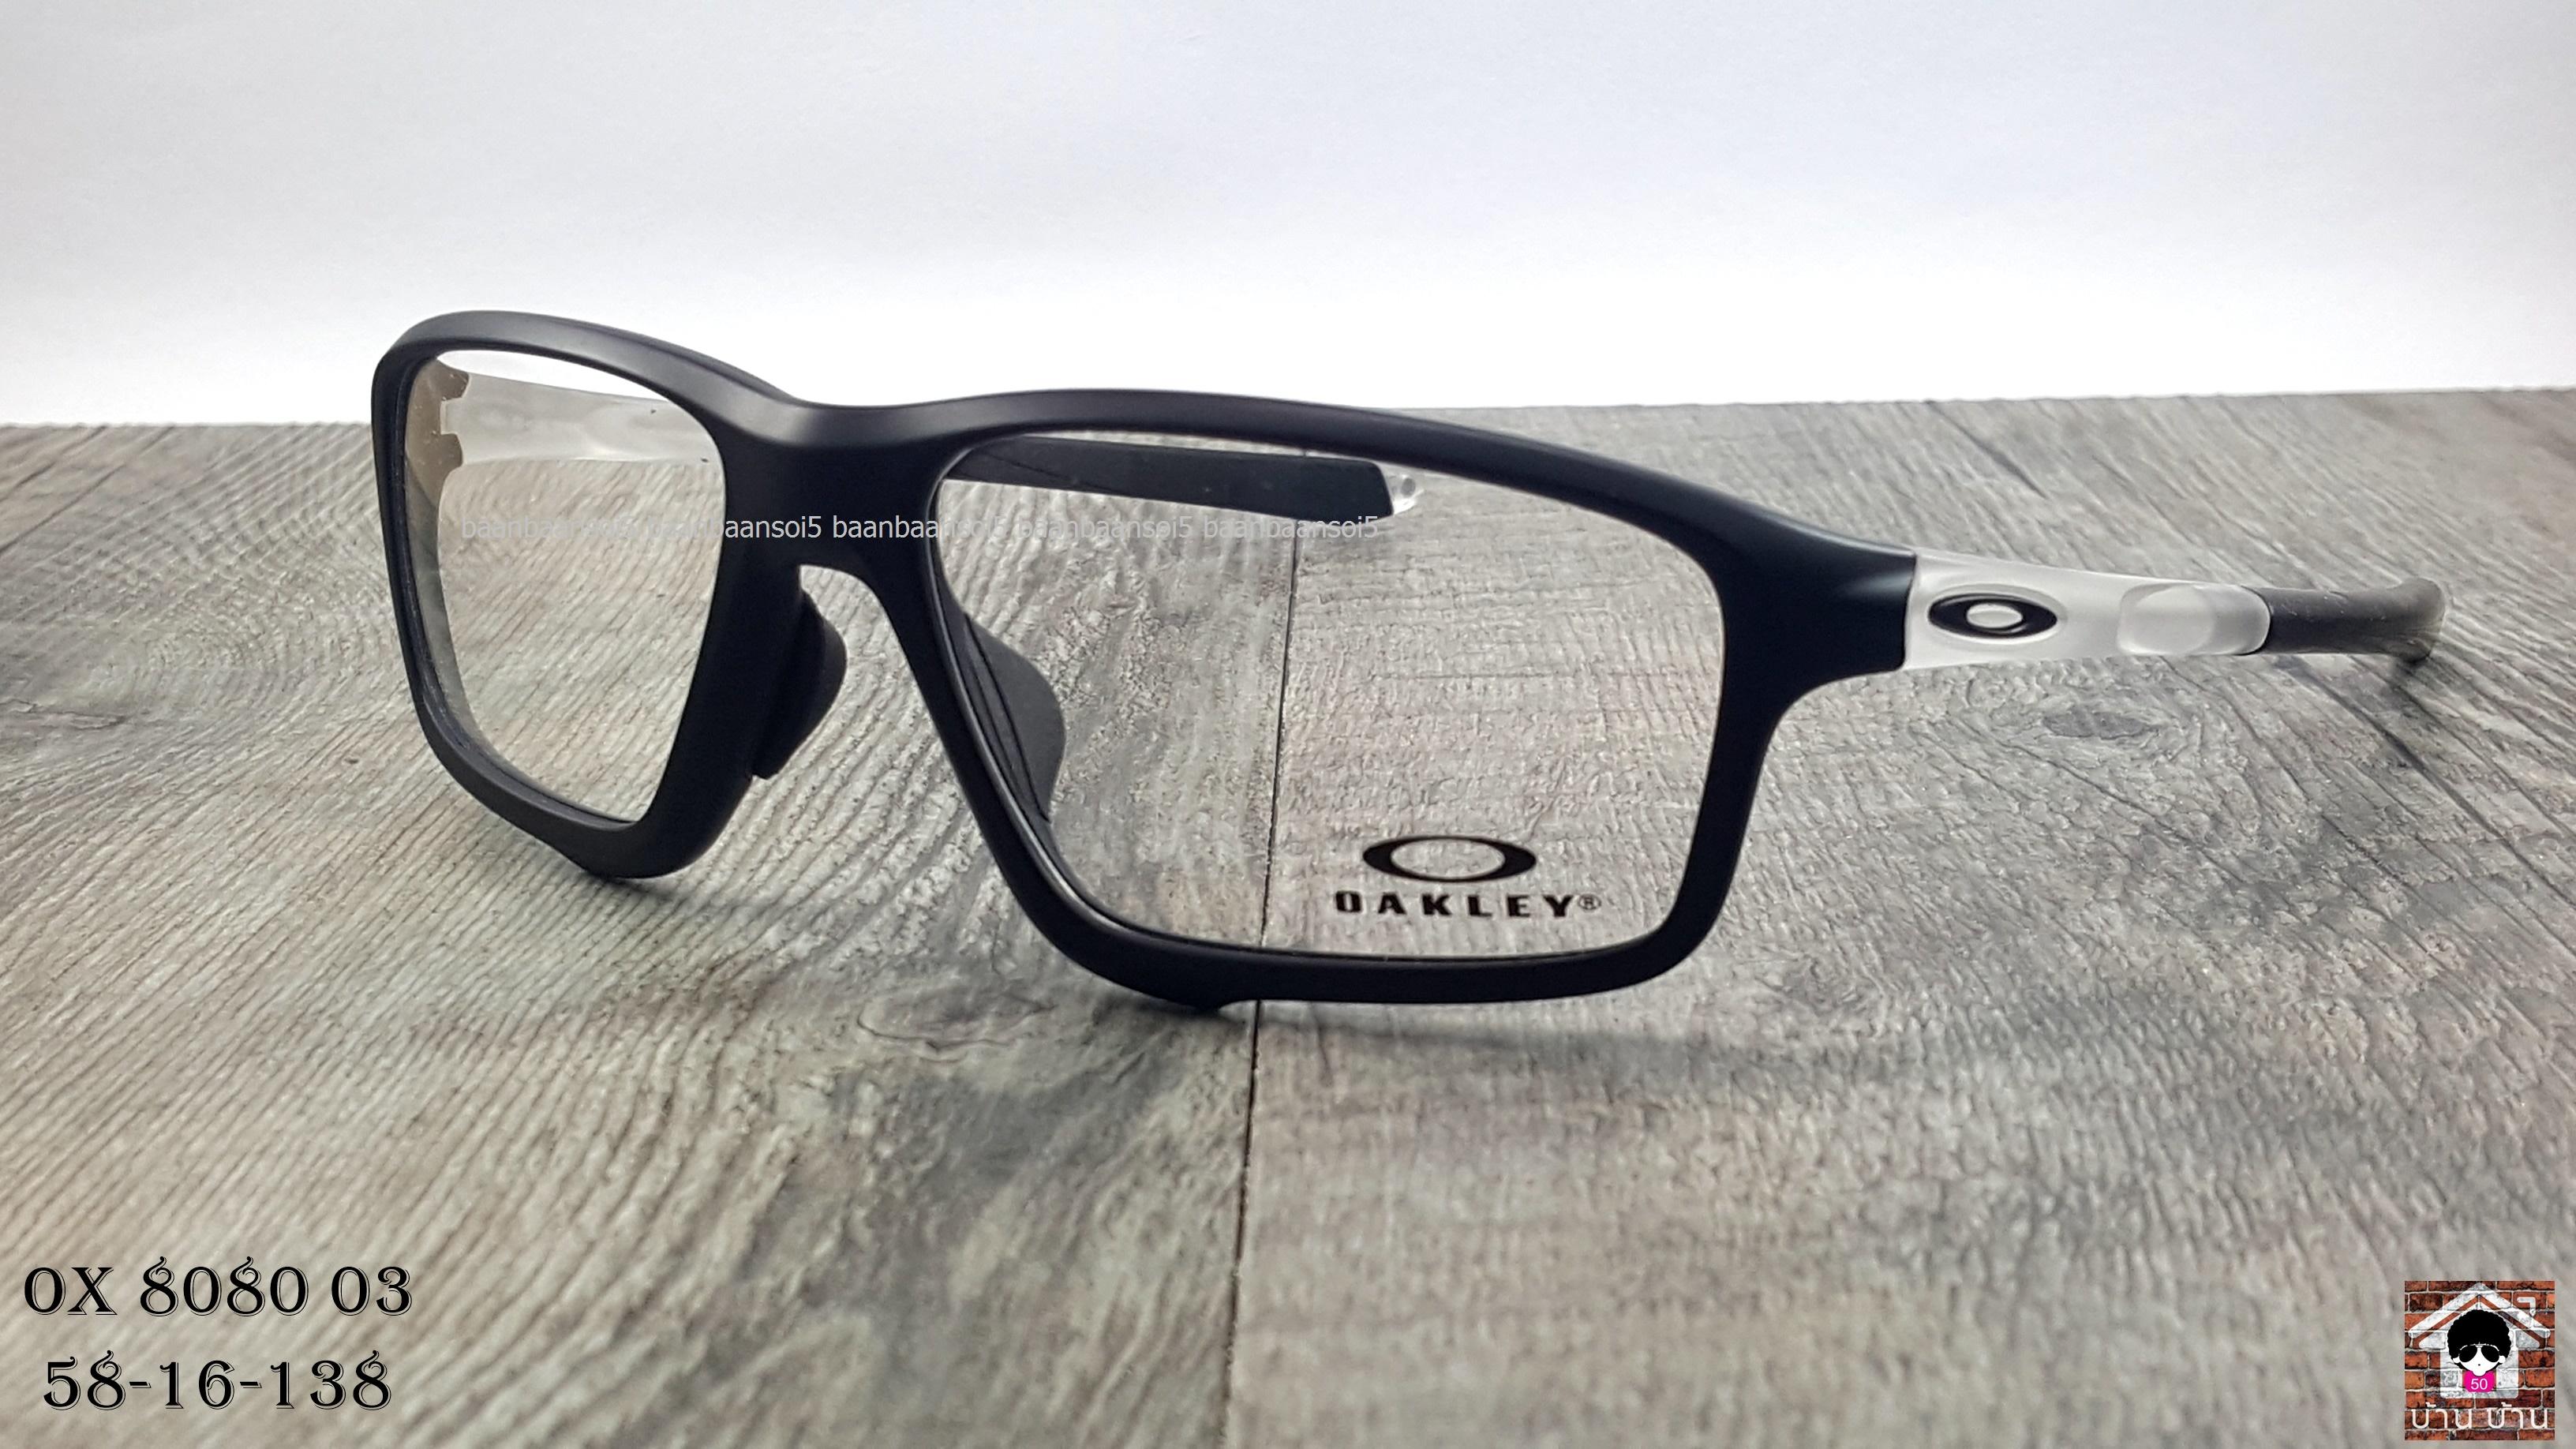 OAKLEY OX8080-03 CROSSLINK ZERO (ASIA FIT) โปรโมชั่น กรอบแว่นตาพร้อมเลนส์ HOYA ราคา 4,100 บาท